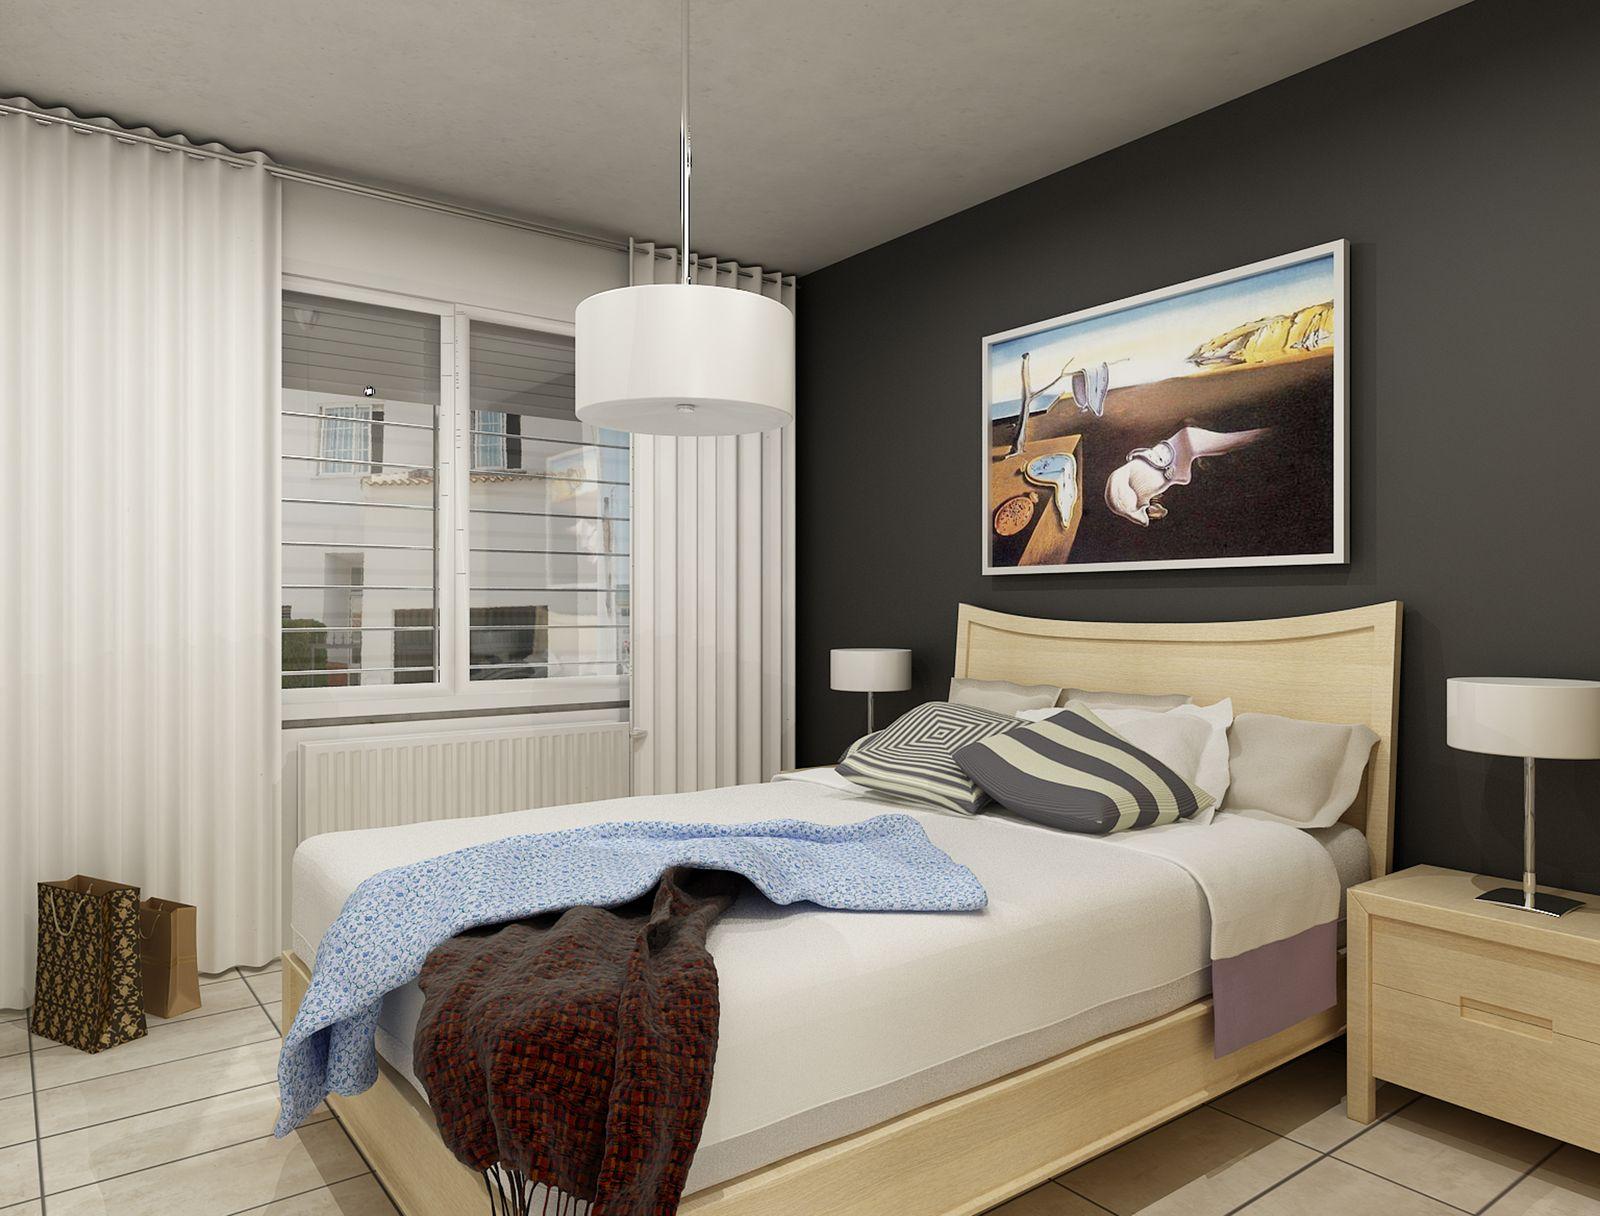 Dormitorios Peque Os Decoraci N ~ Decorar Dormitorio Matrimonio Pequeño